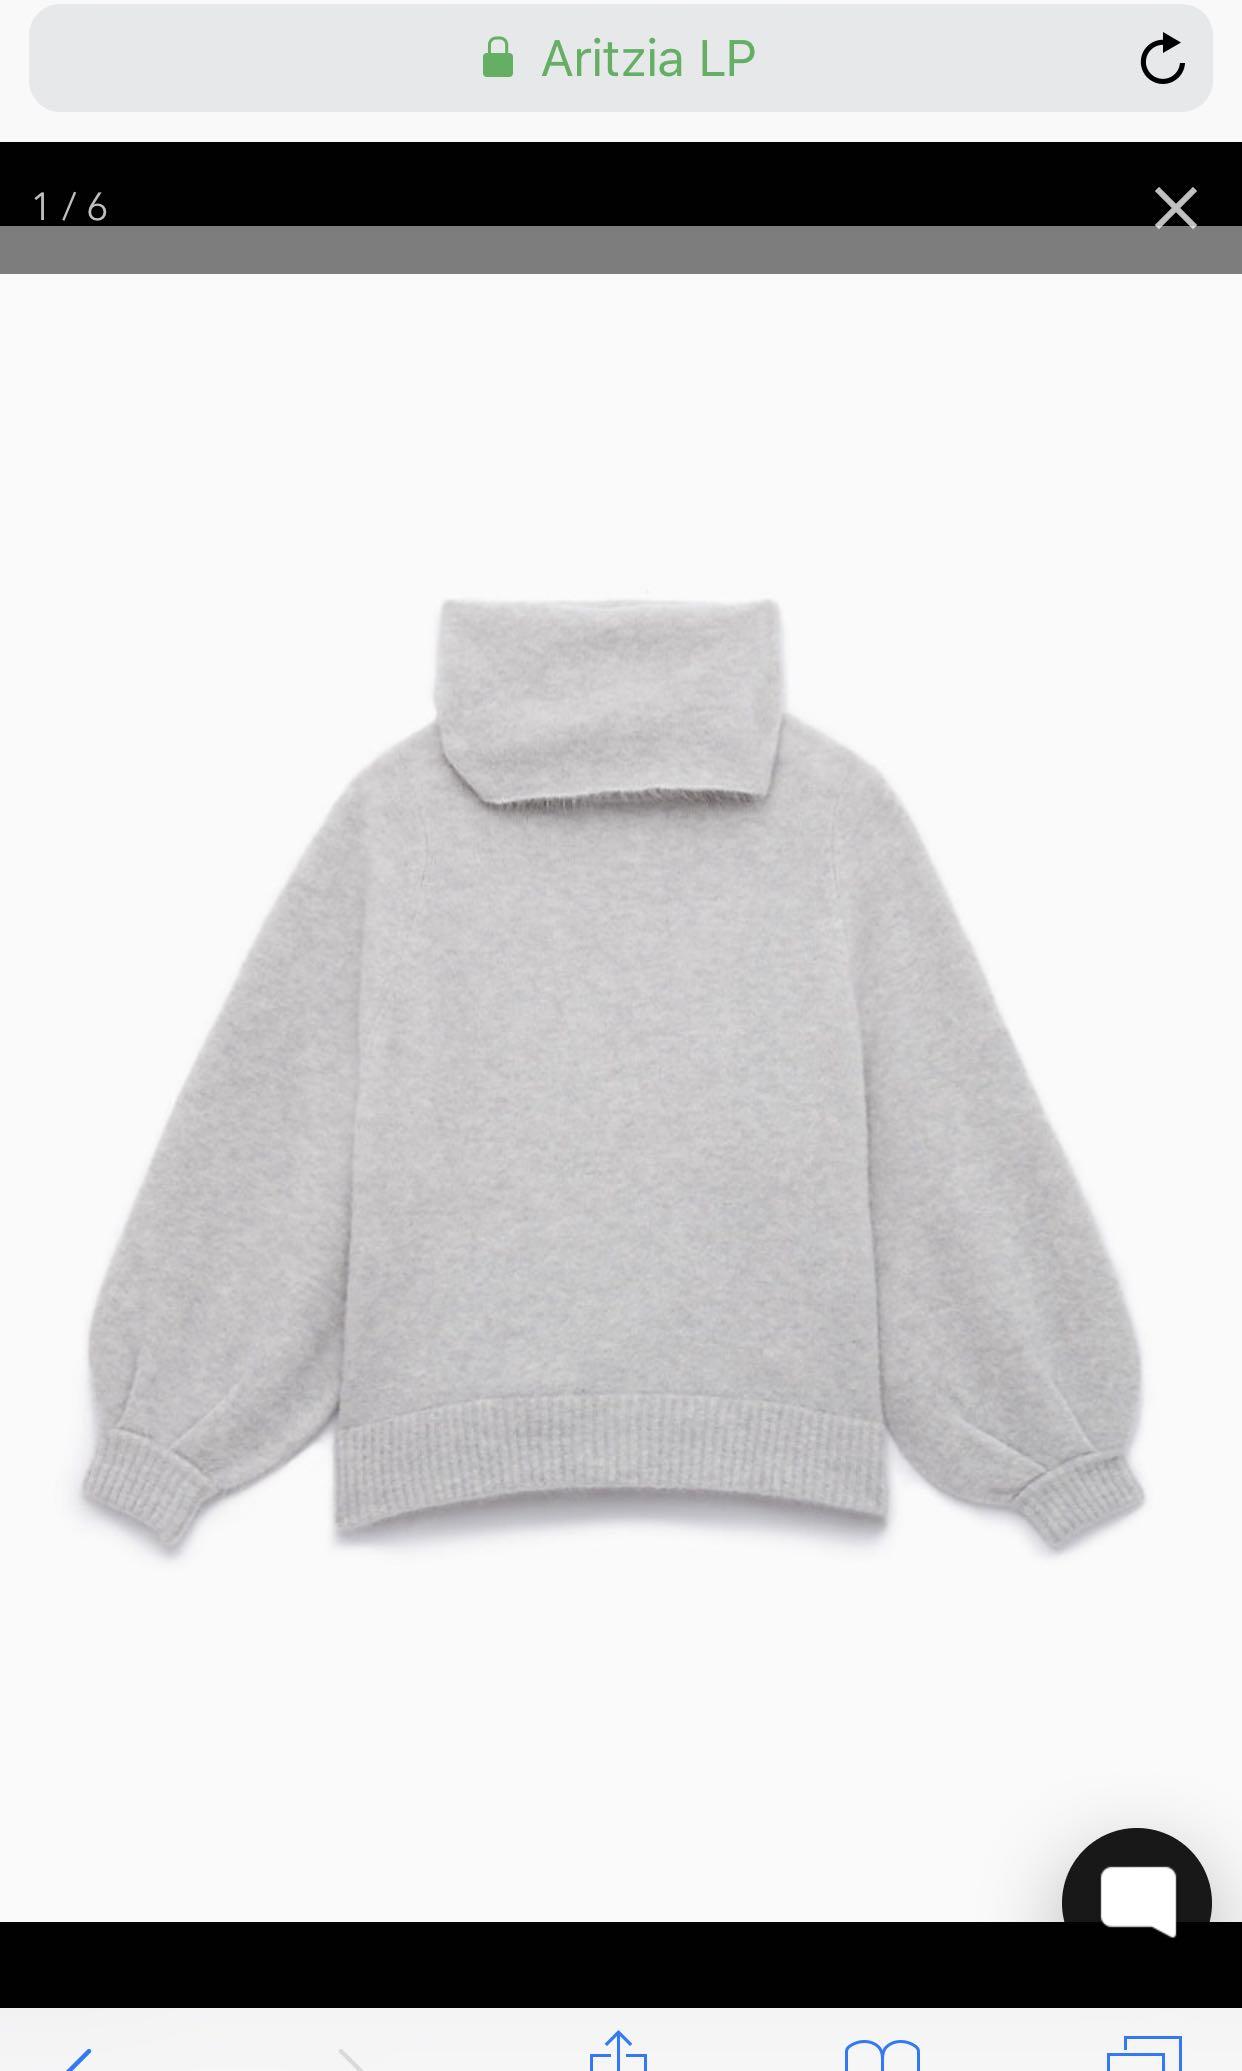 Aritzia 1-01 Babaton Adichie Sweater Size 2 (S)